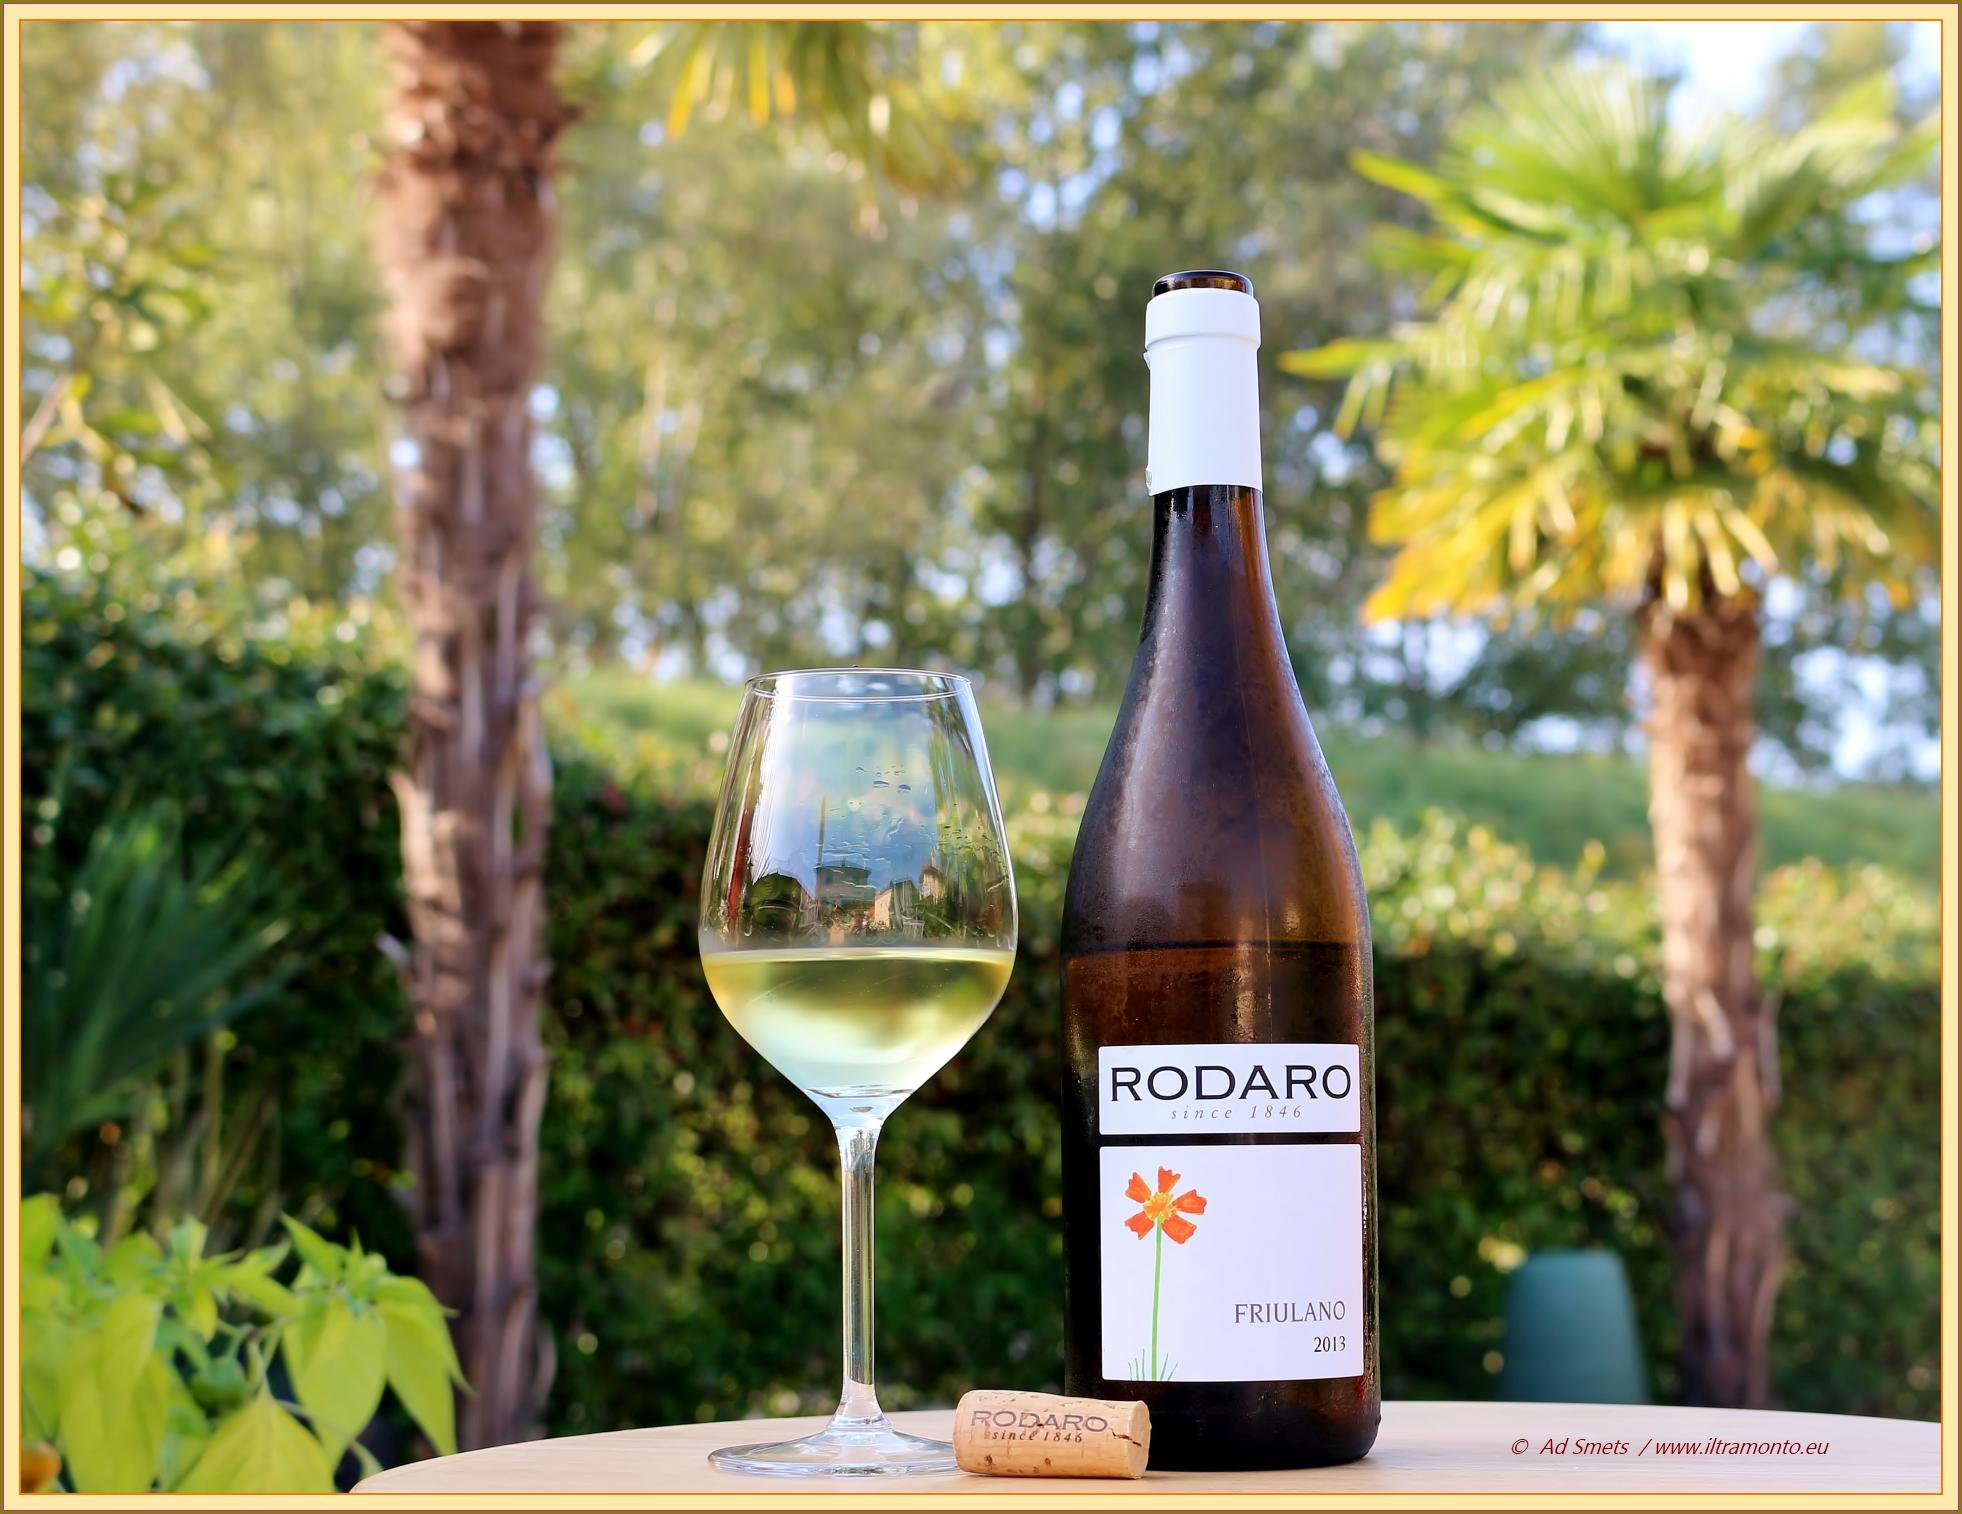 friulano-rodaro_3665_il-tramonto-wines